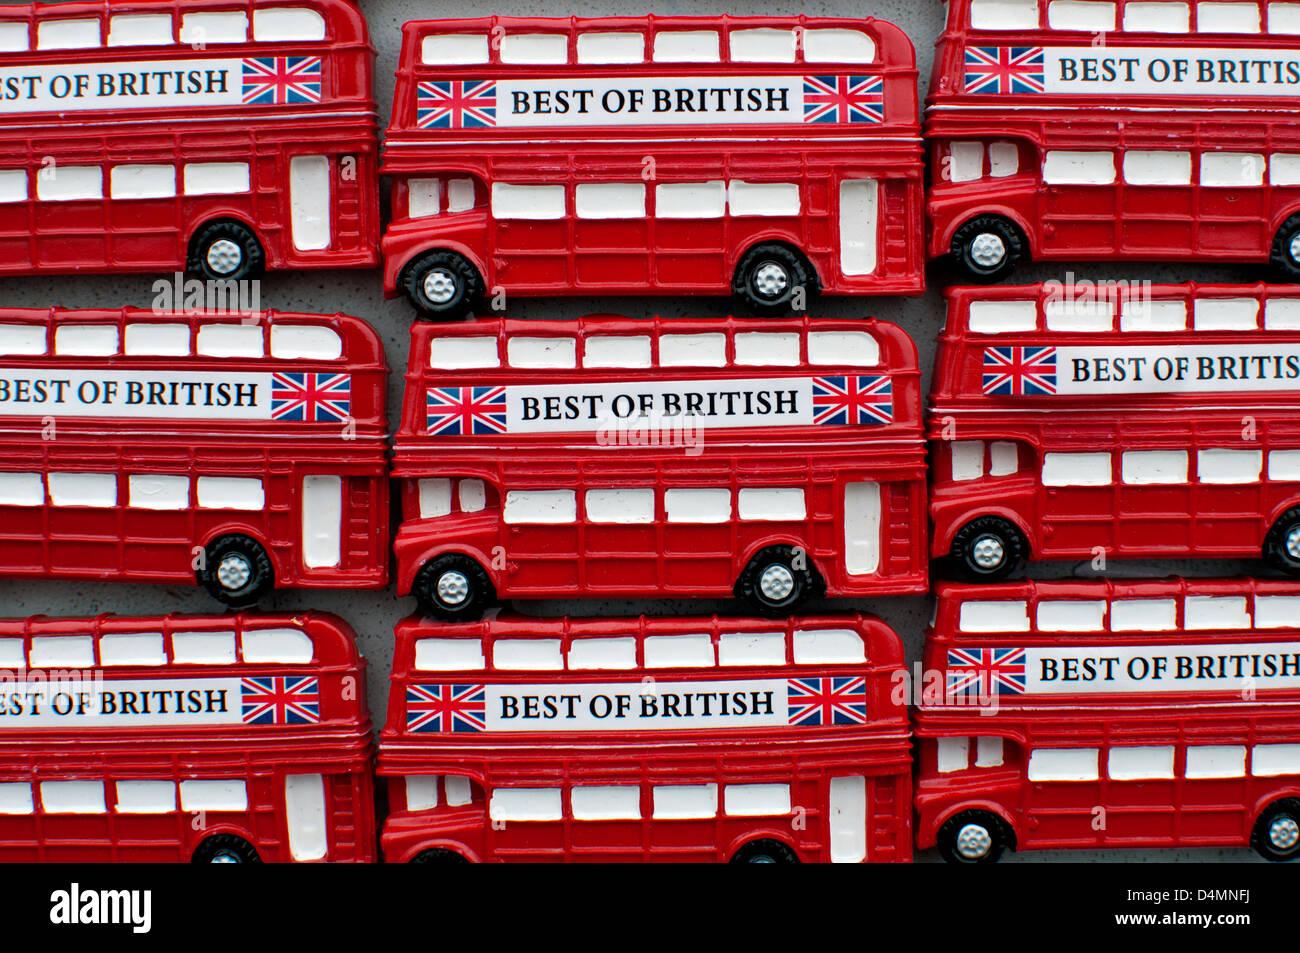 red london bus abzeichen stockfoto bild 54545670 alamy. Black Bedroom Furniture Sets. Home Design Ideas